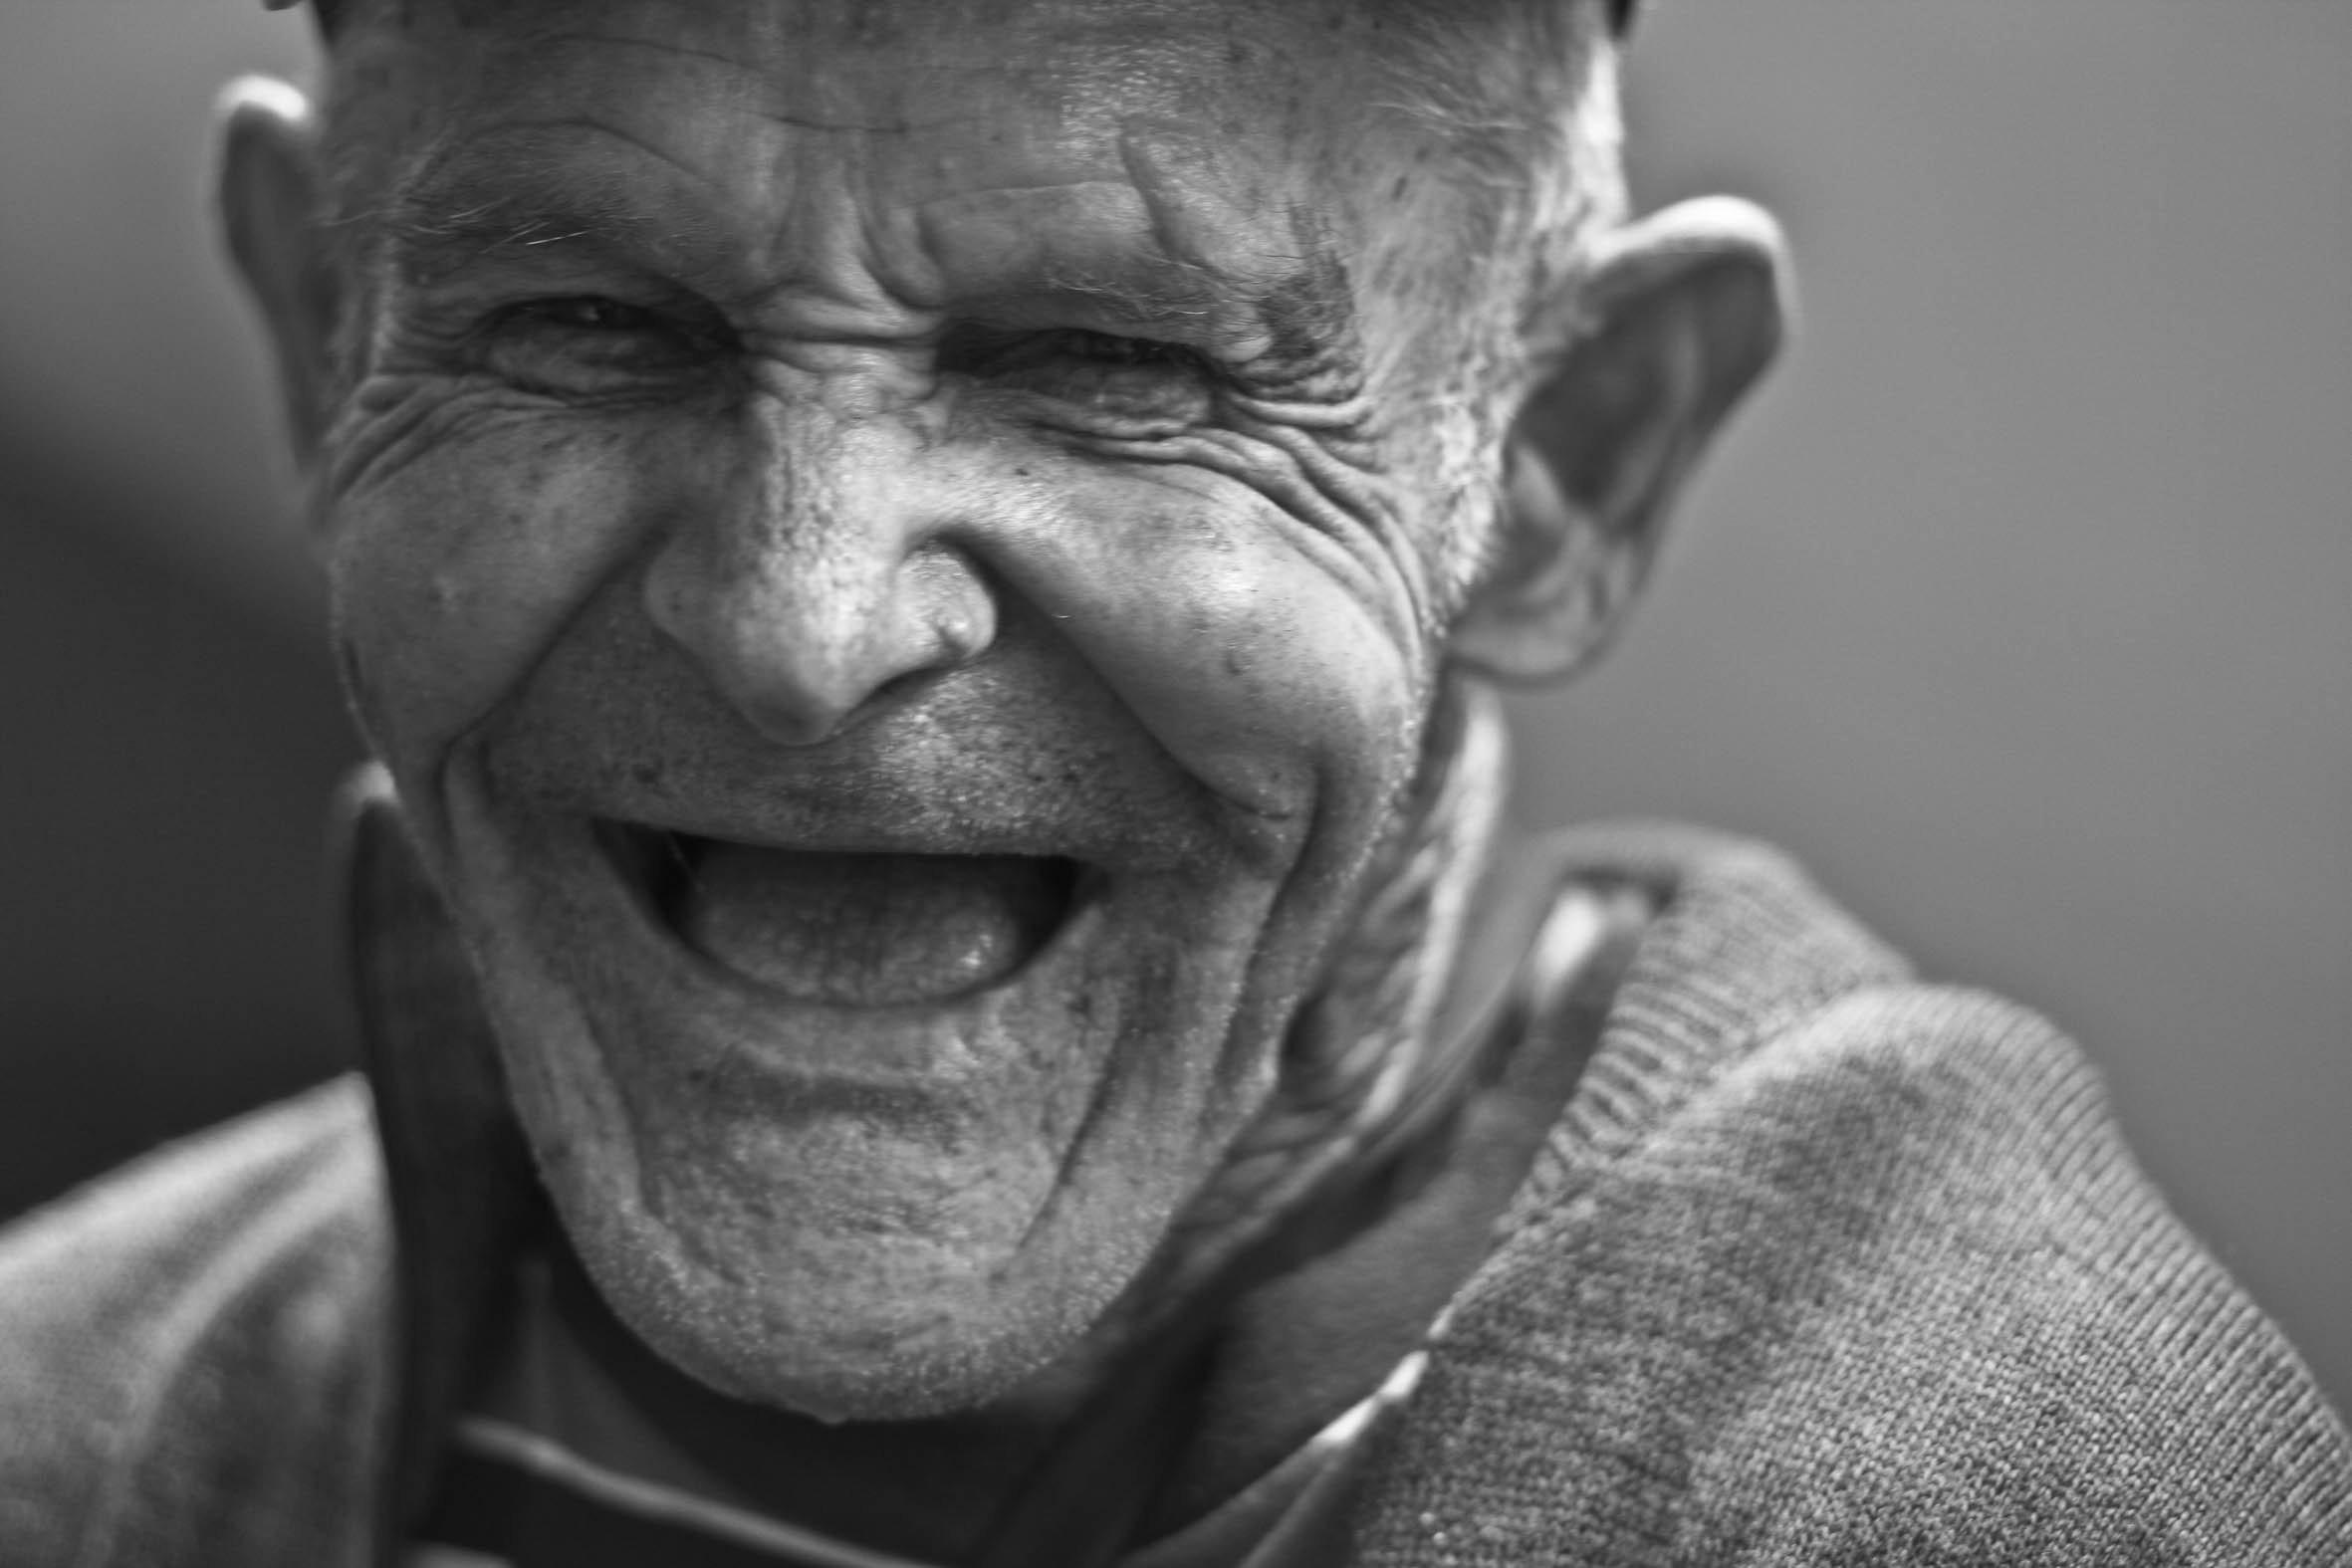 Old nacked man